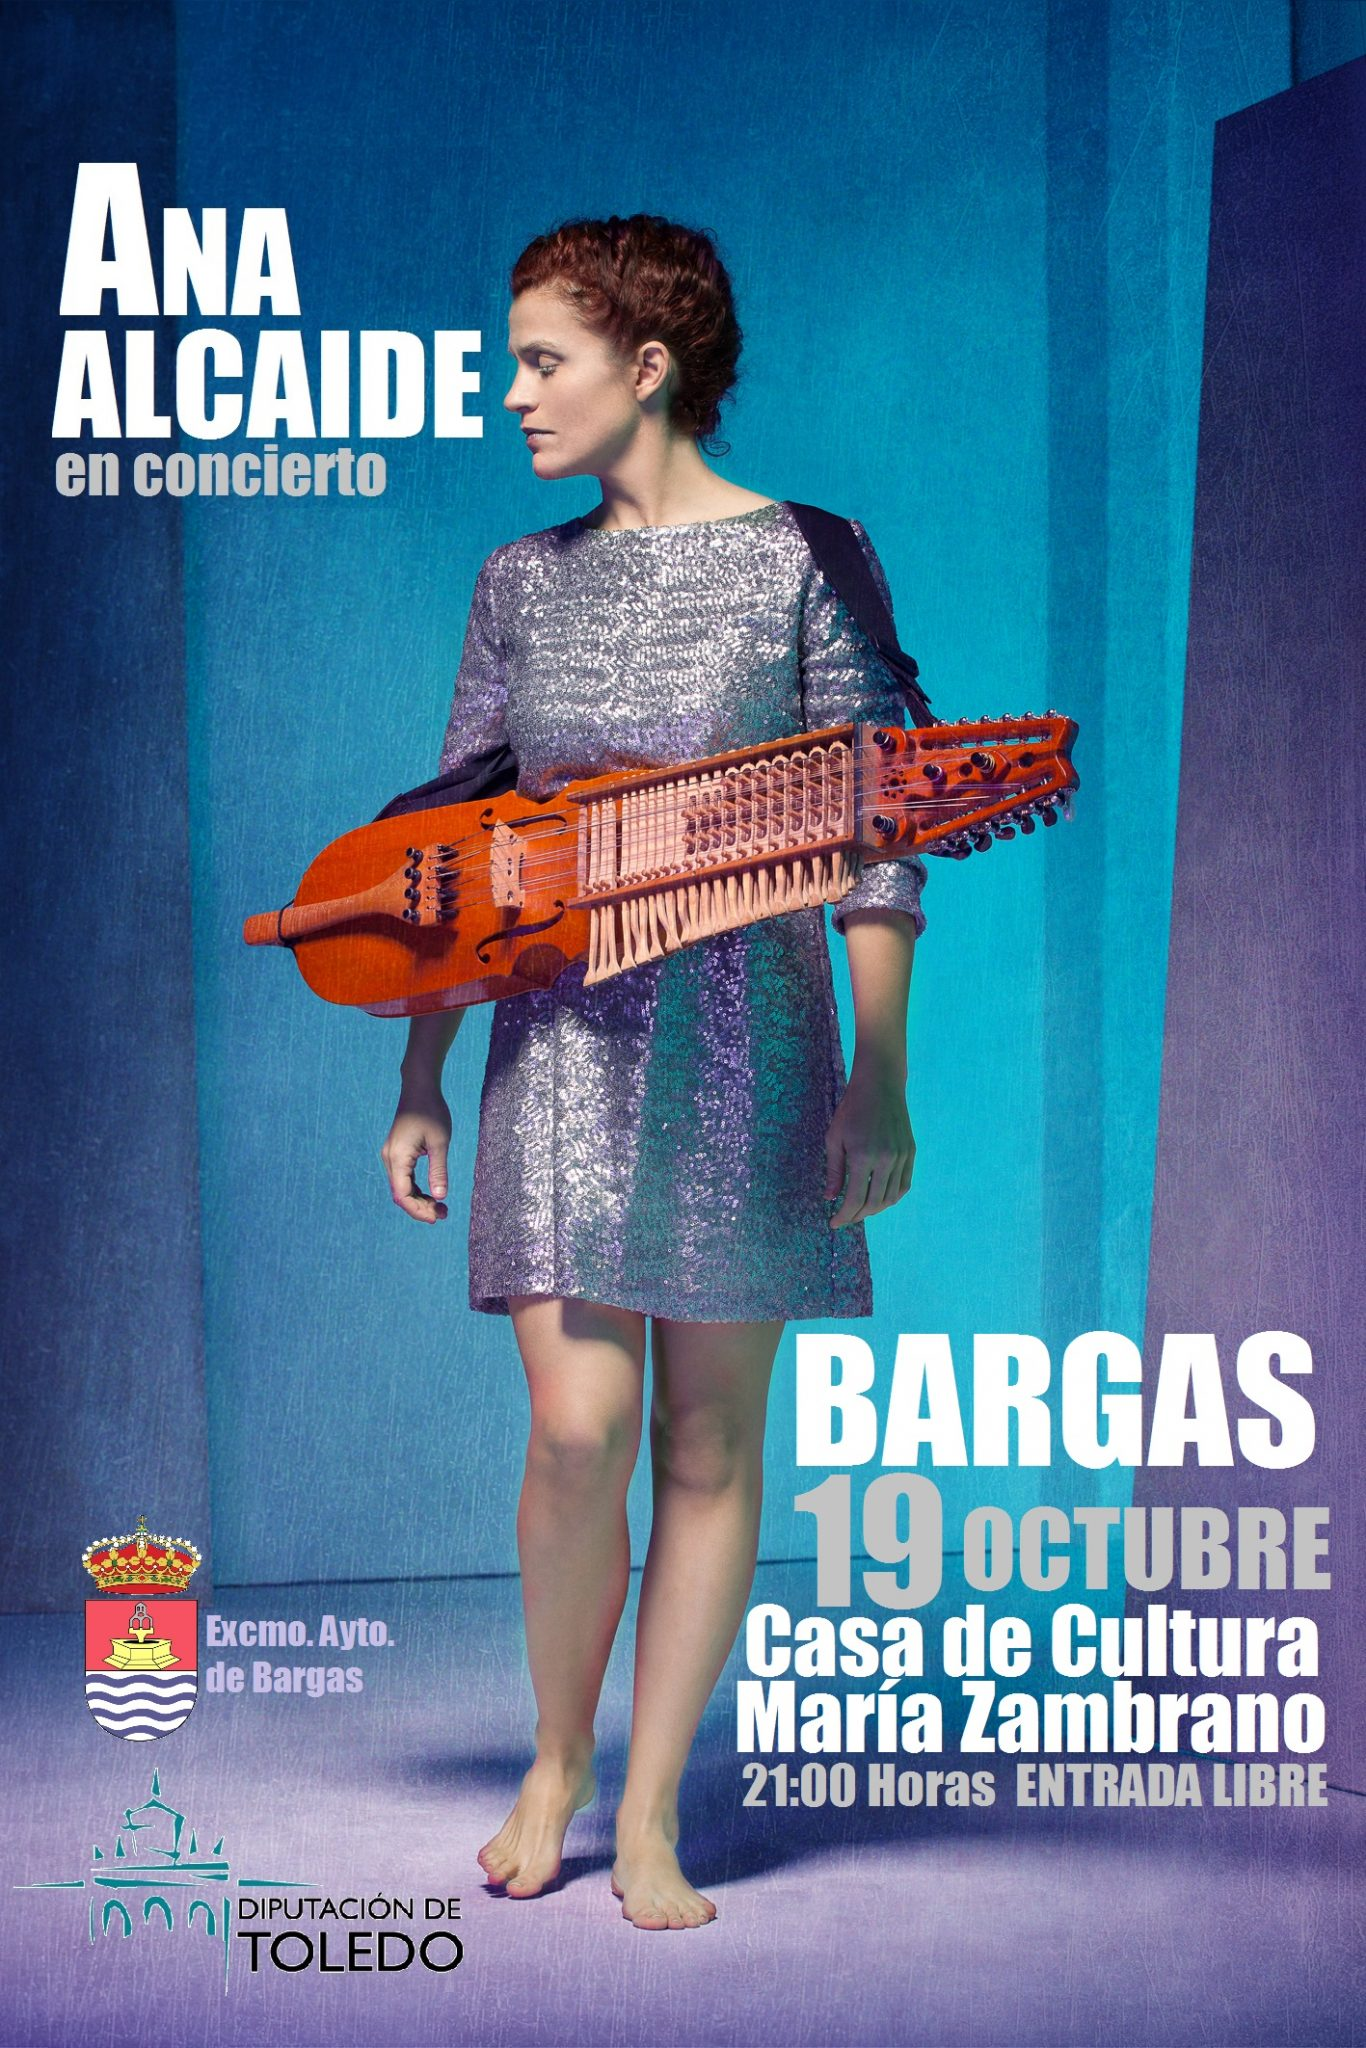 Concierto: Ana Alcaide